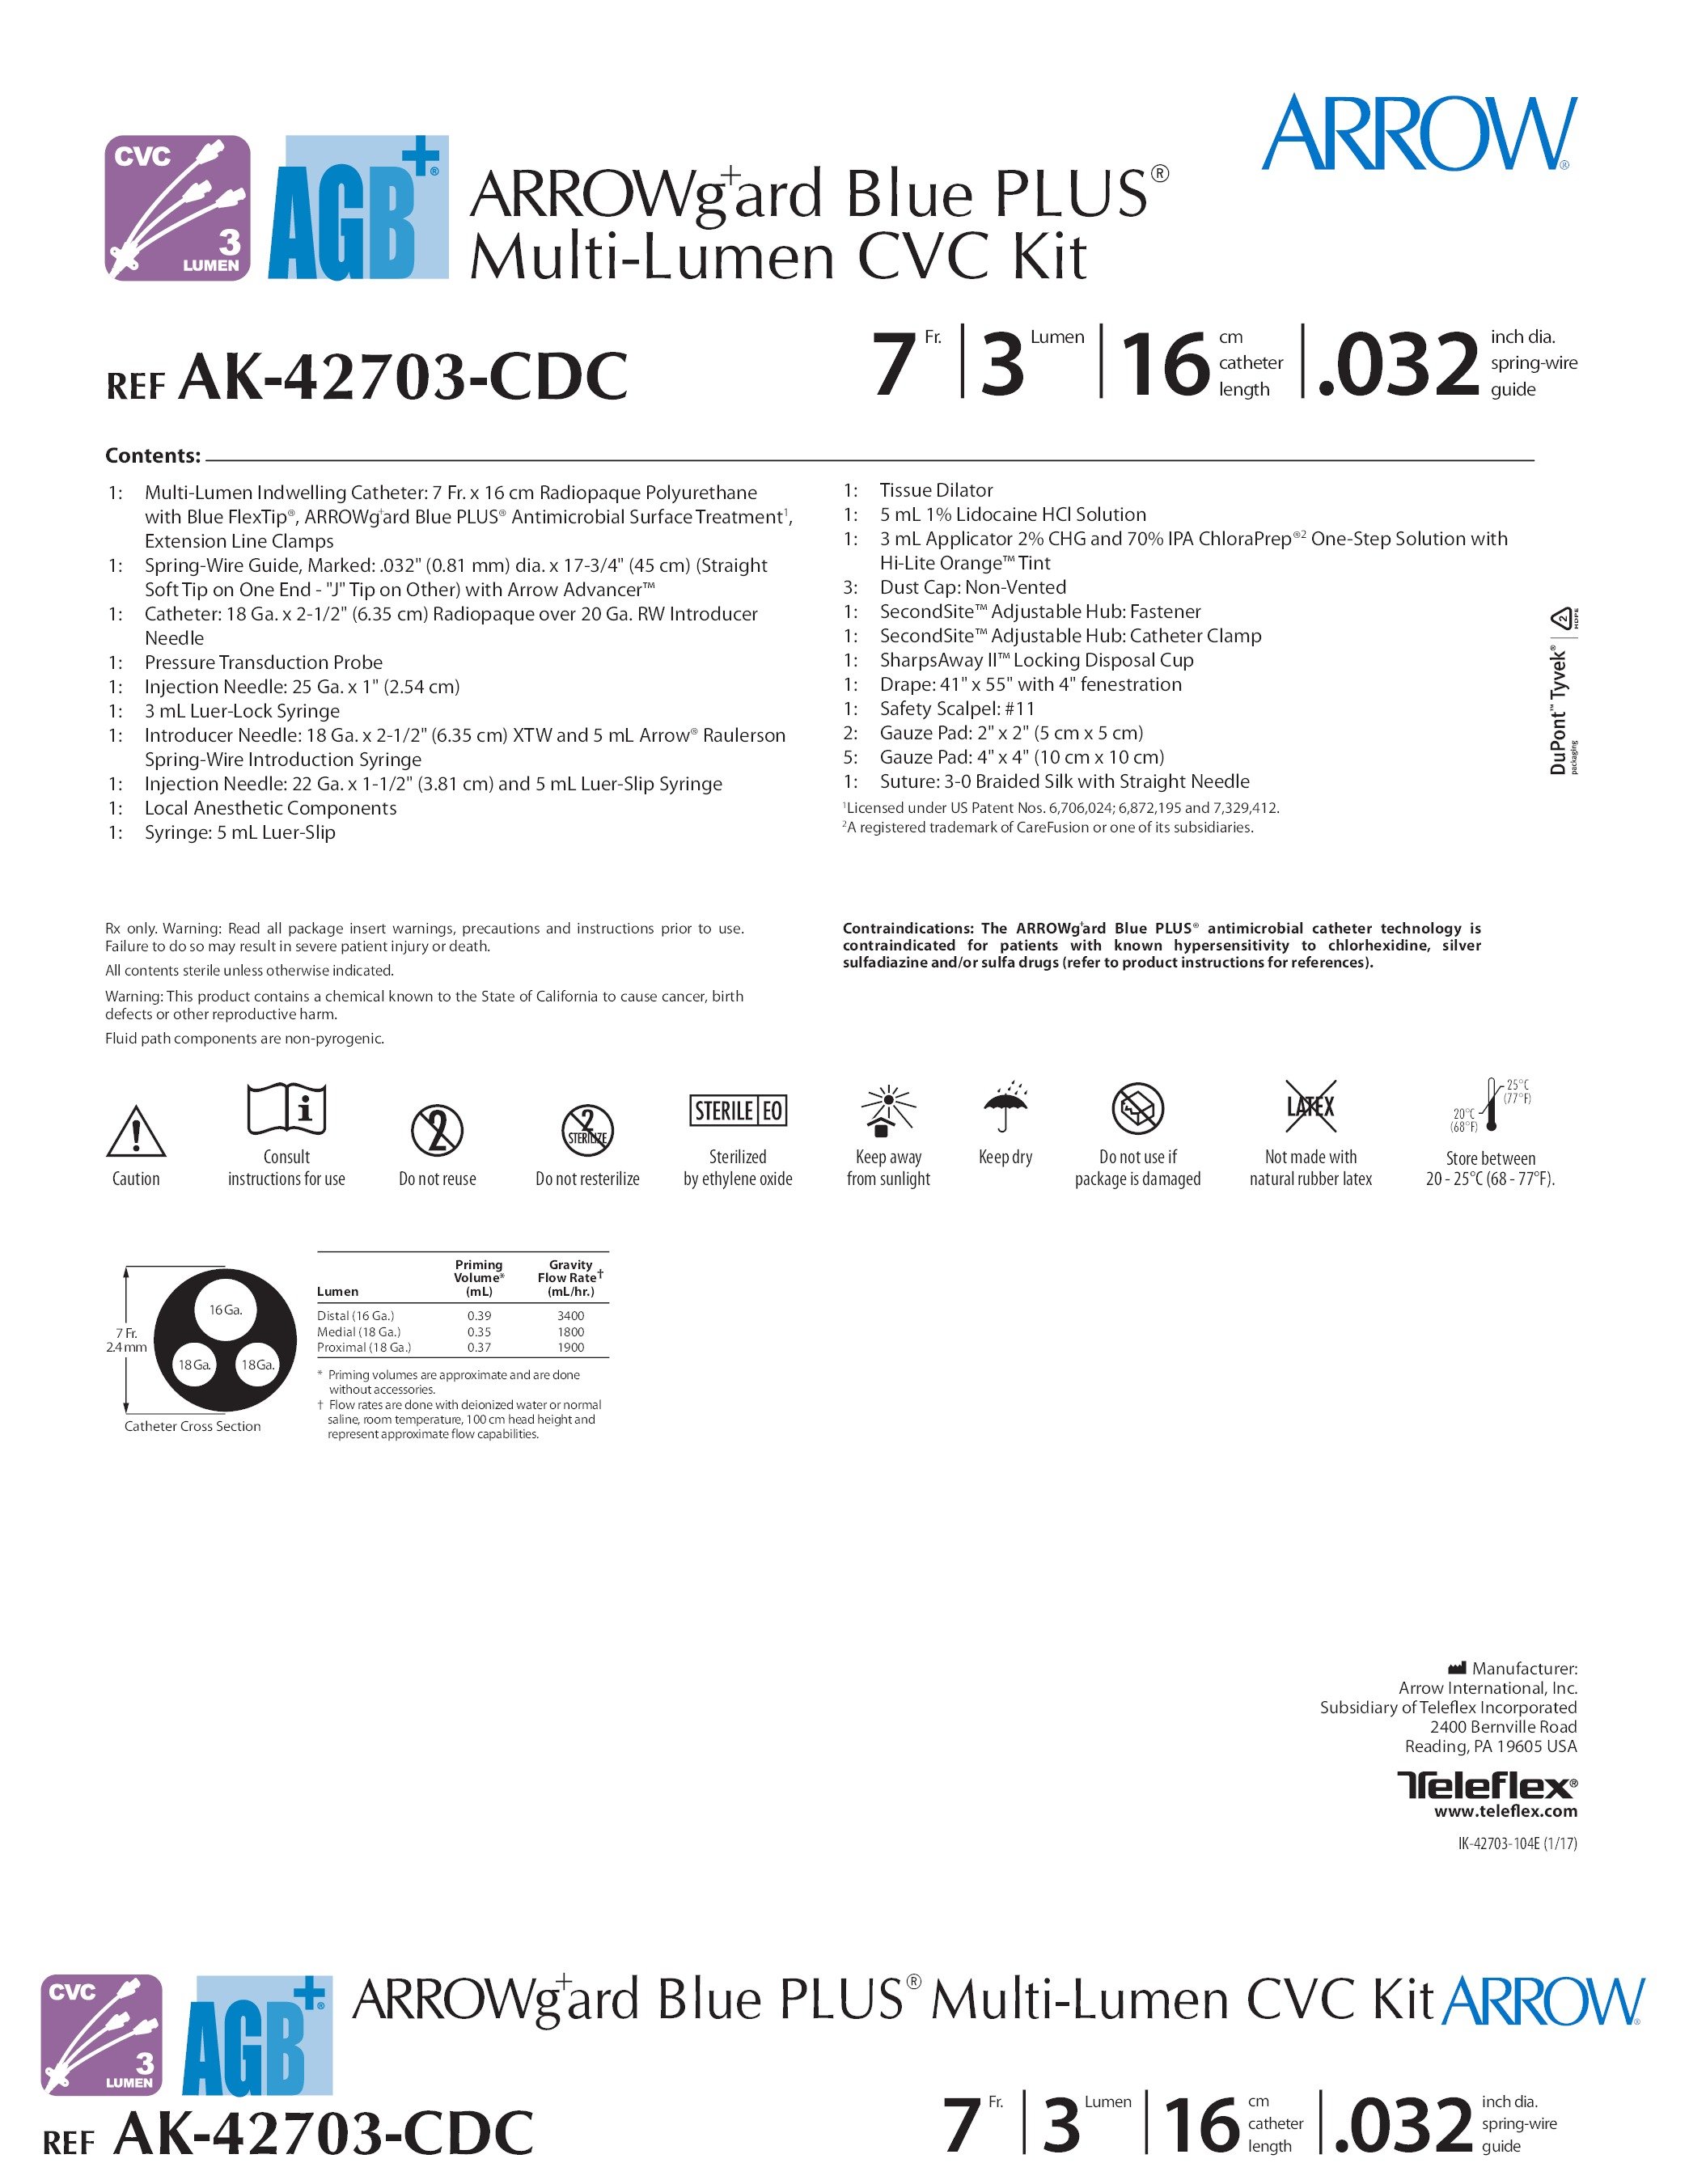 ak 42703 cdc teleflex incorporated vascular access product catalog